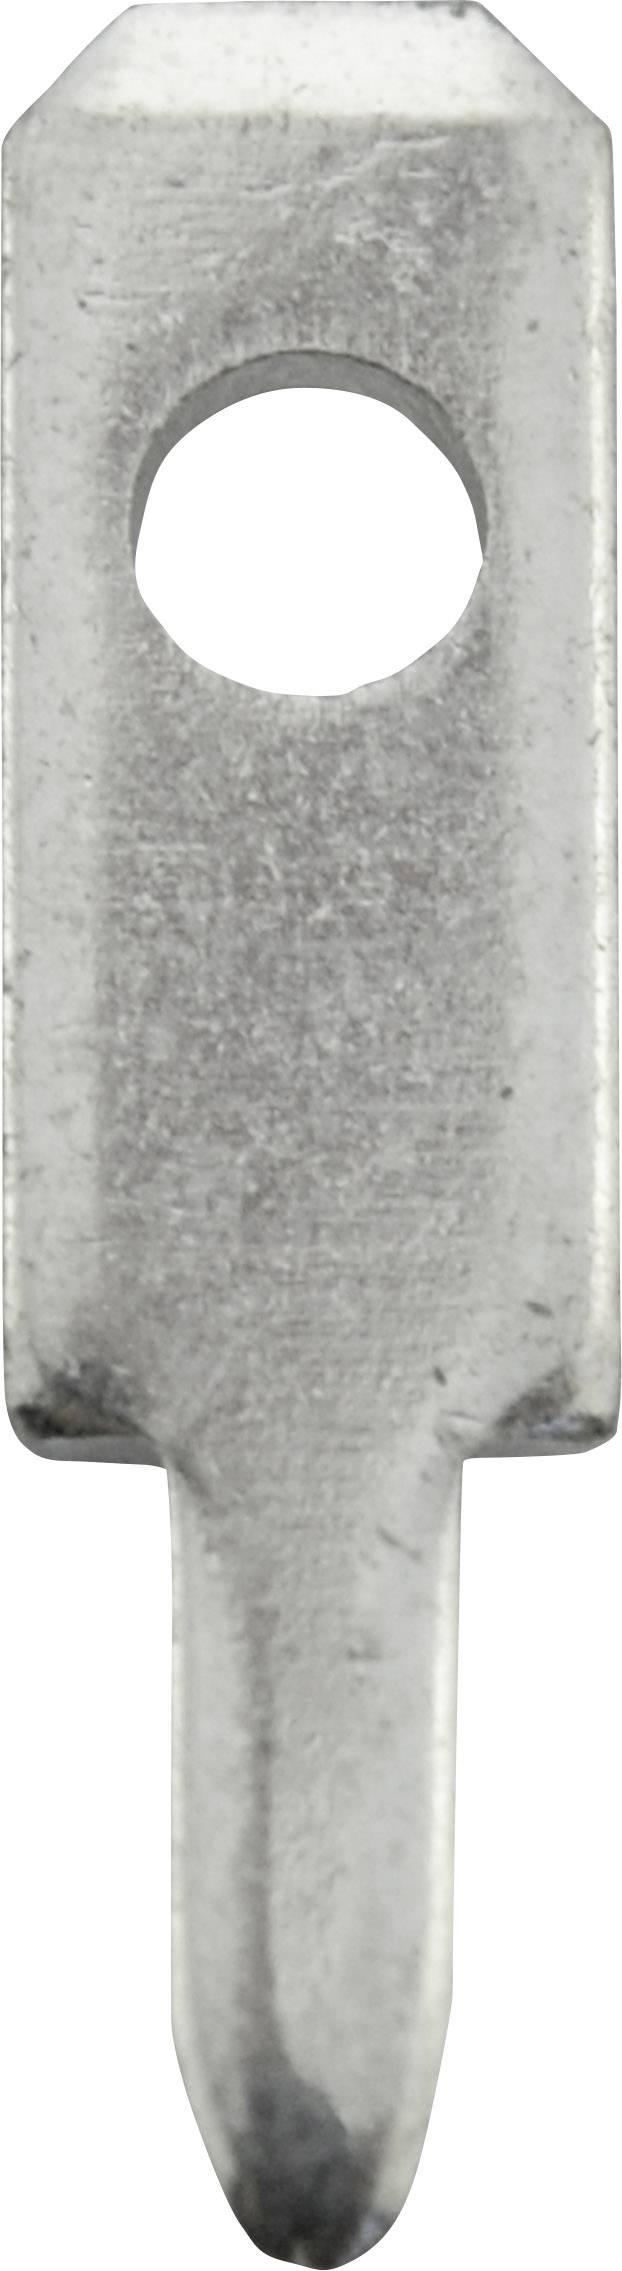 Jazýček konektora Vogt Verbindungstechnik 378008,68 2.8 mm x 0.8 mm, 180 °, neizolované, kov, 100 ks